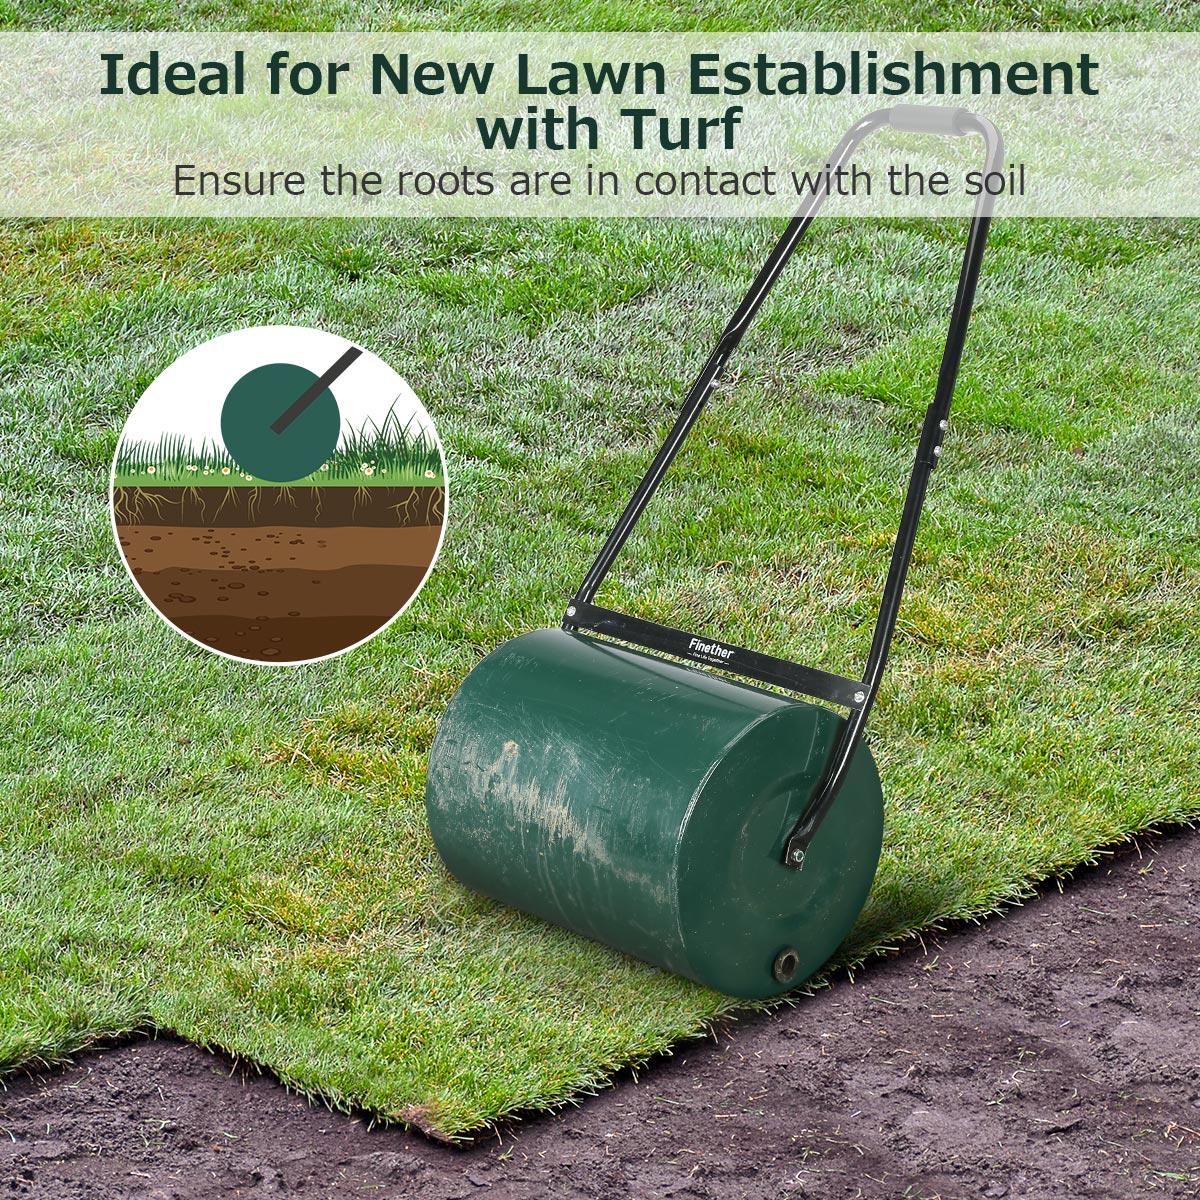 Drum-Lawn-Roller Garden-Tools With Scraper-Bar Manual Removable Drain Fill-Plug 46L/30L